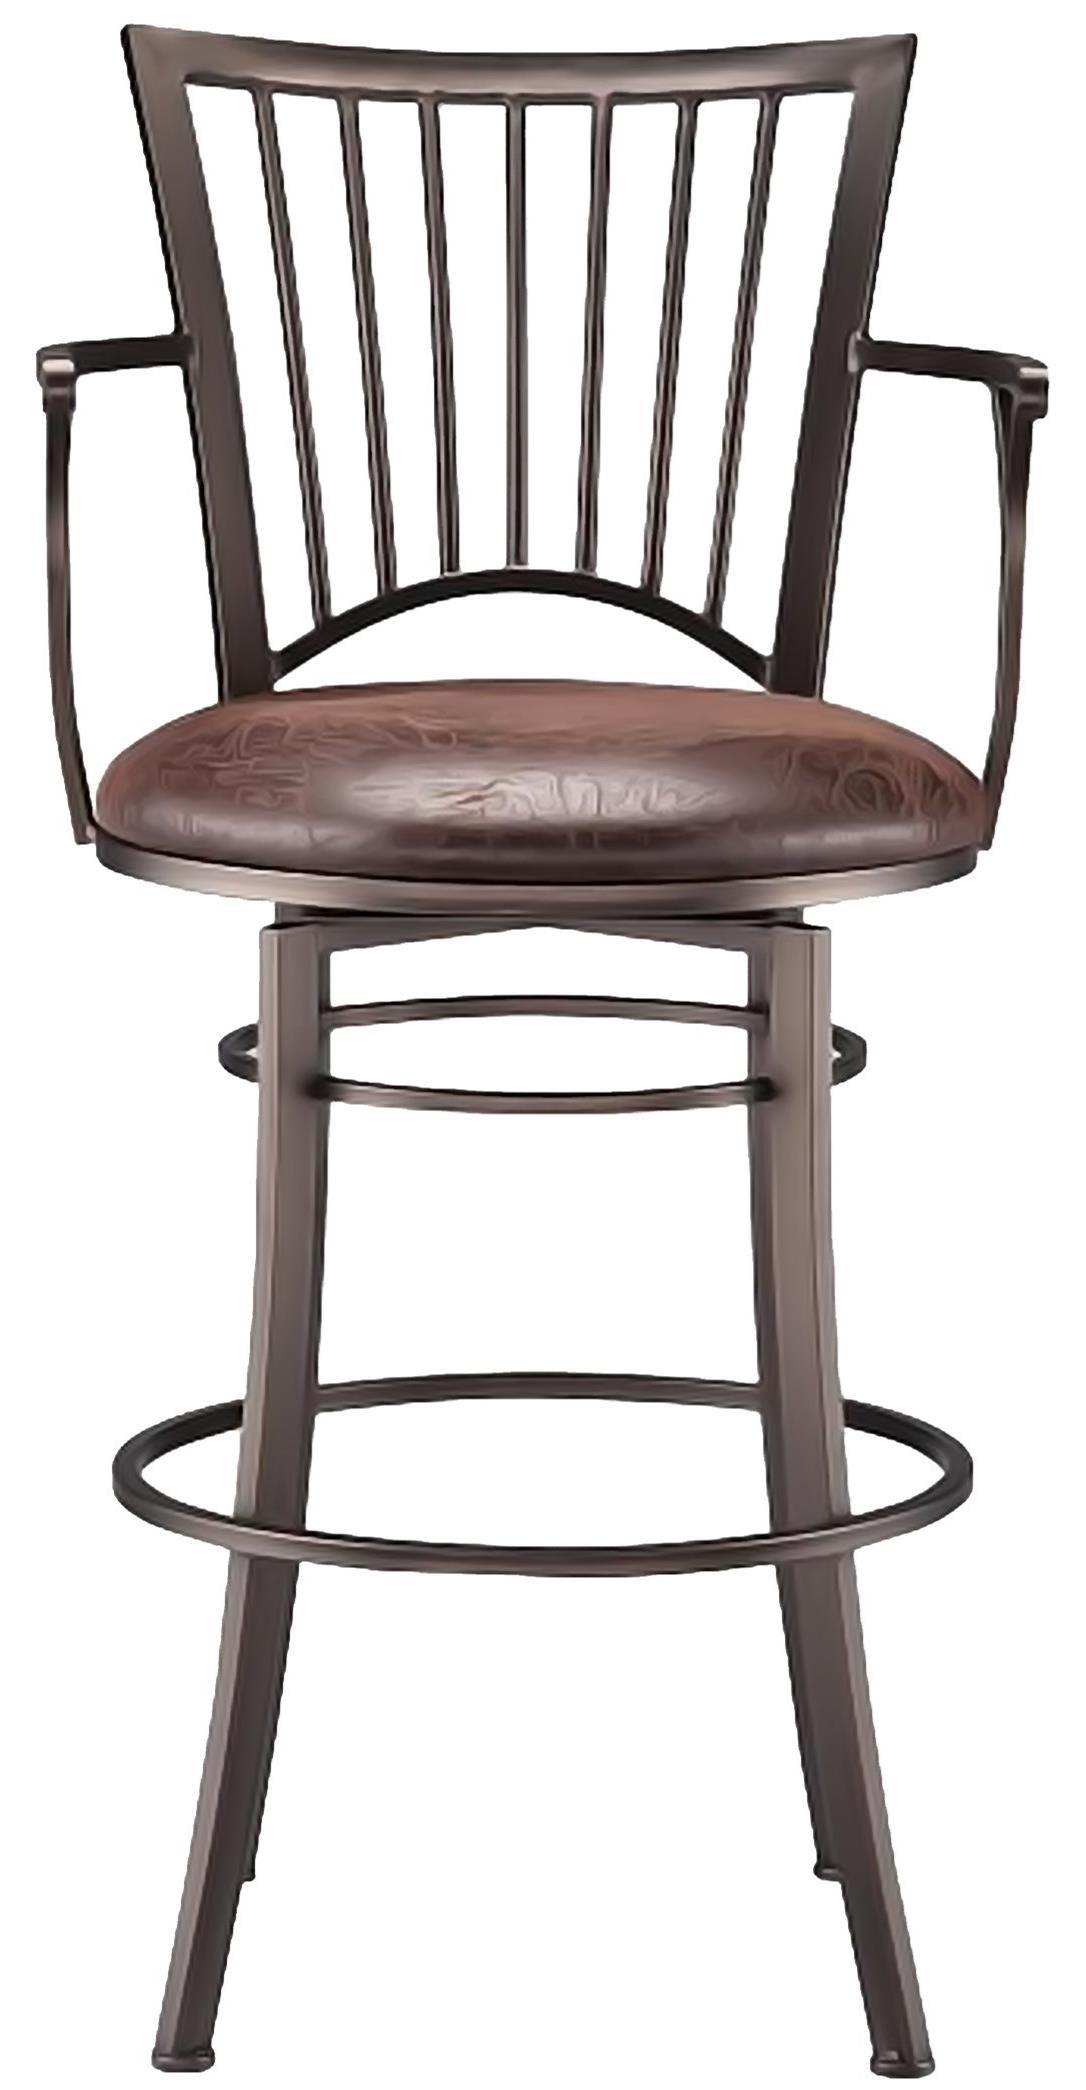 Bar Stools Accent Morgan Swivel bar height bar Stool at Walker's Furniture